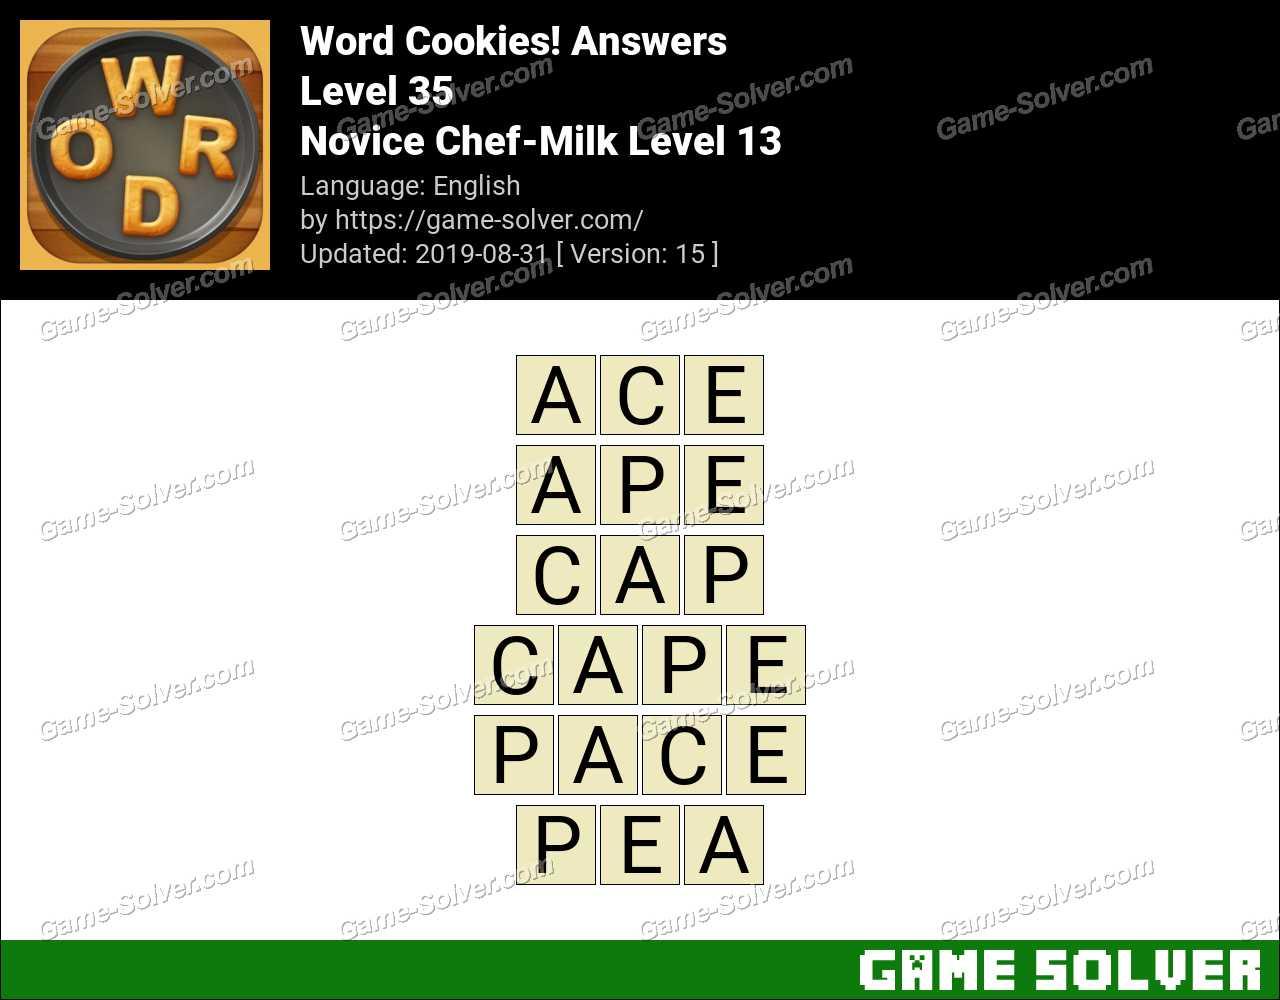 Word Cookies Novice Chef-Milk Level 13 Answers